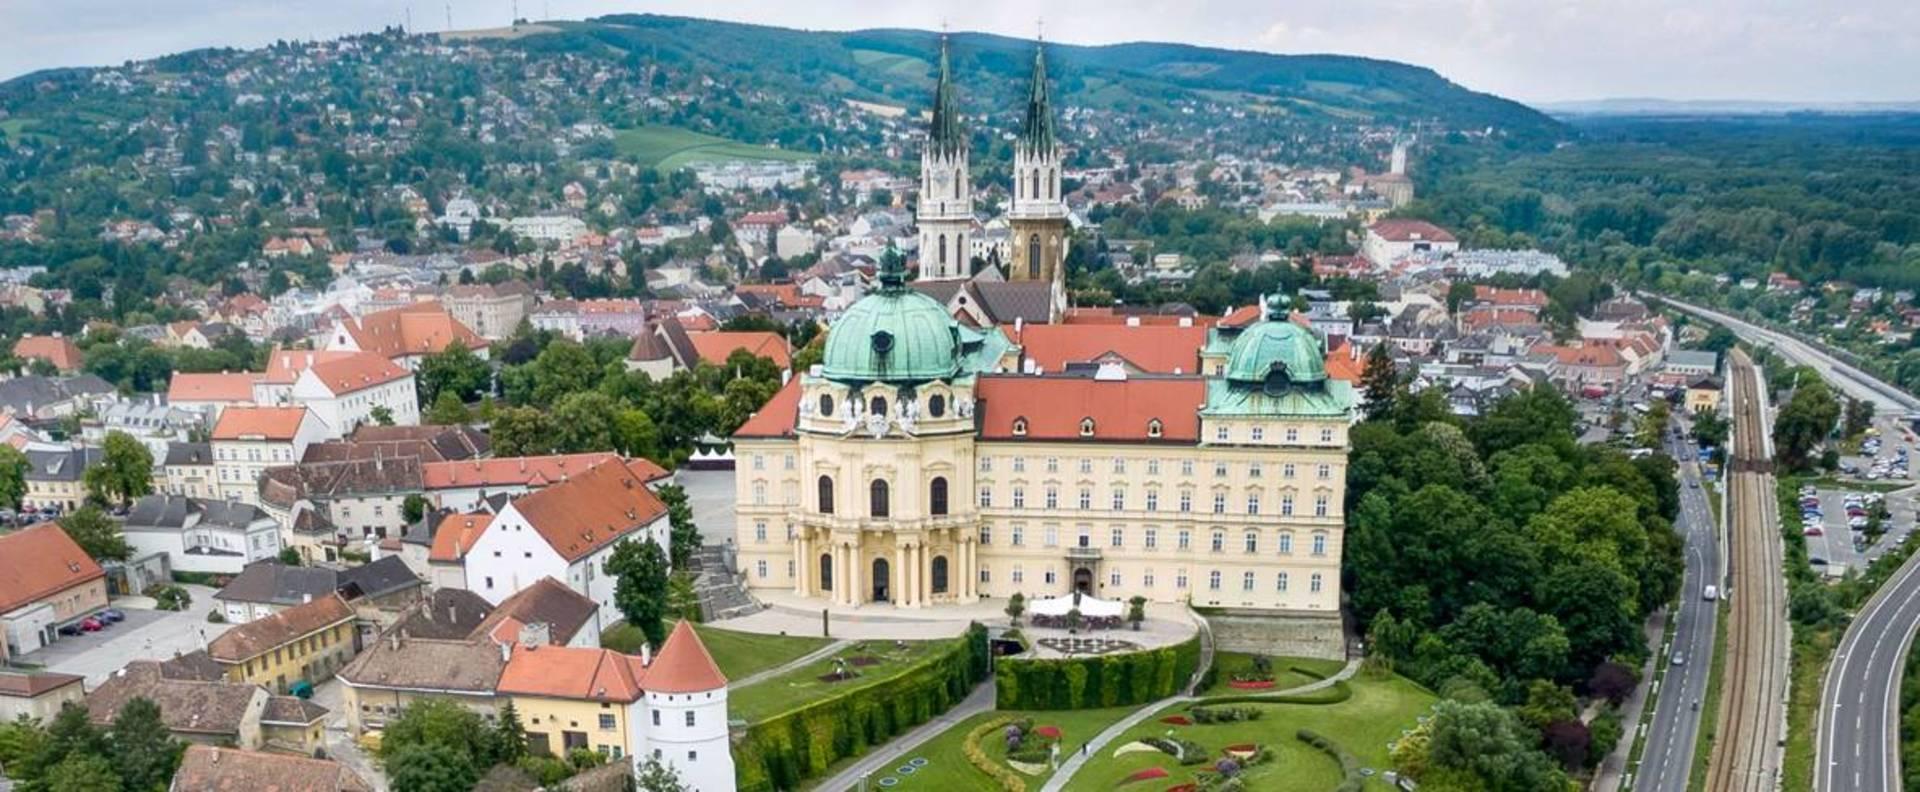 Stift Klosterneuburg Panorama